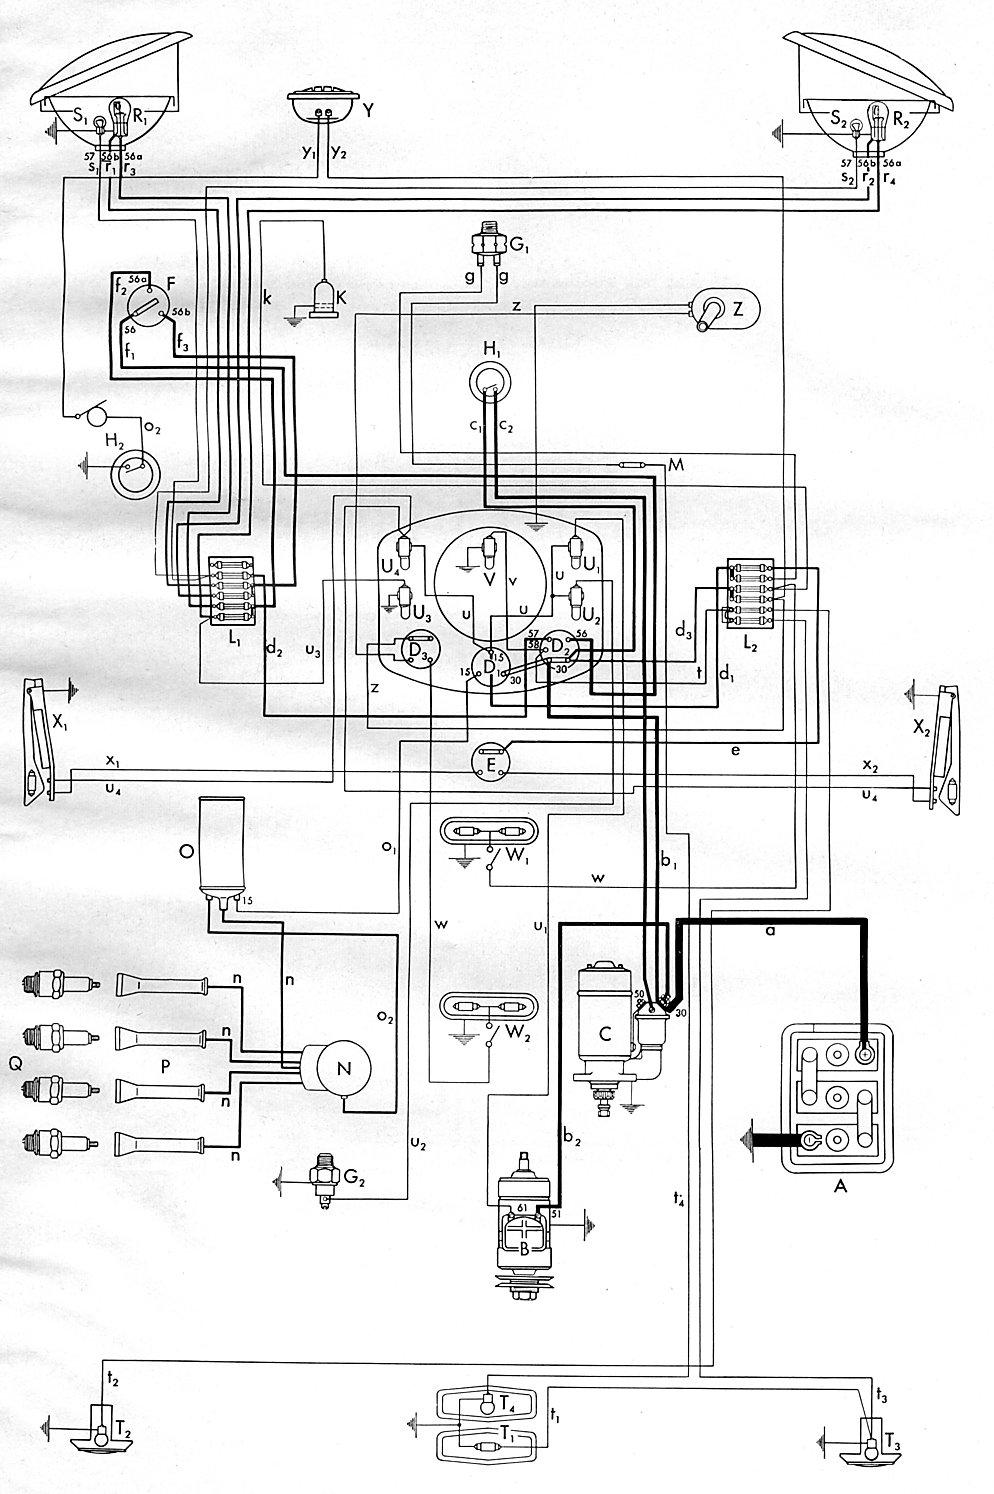 hight resolution of 1970 vw beetle fuse box diagram 1965 vw beetle wiring 1965 volkswagen beetle interior 1965 vw